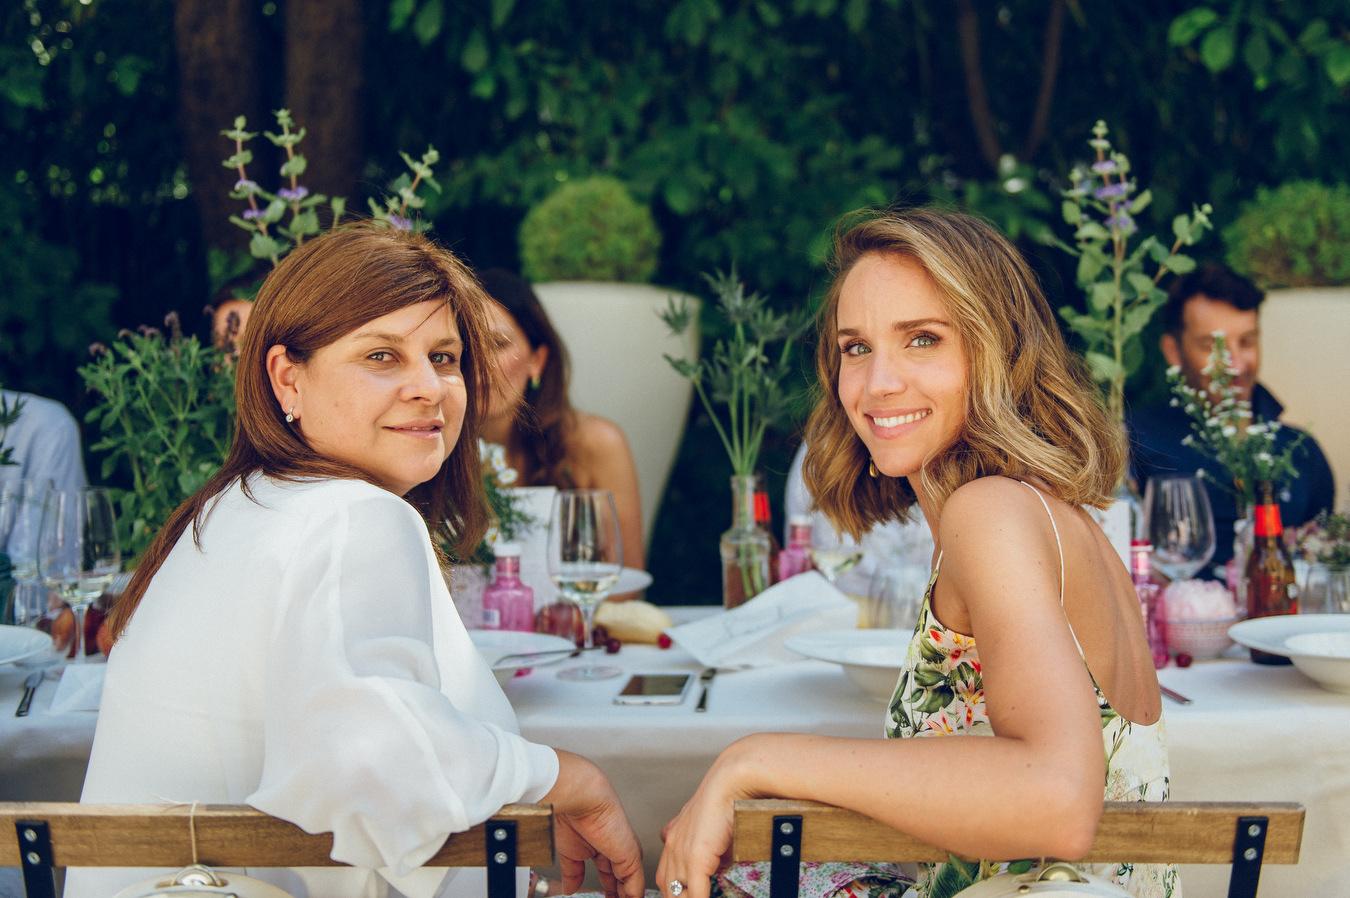 calista-one-lista-de-bodas-online-blog-de-bodas-calista-one-summer-party-2016-invitados-5